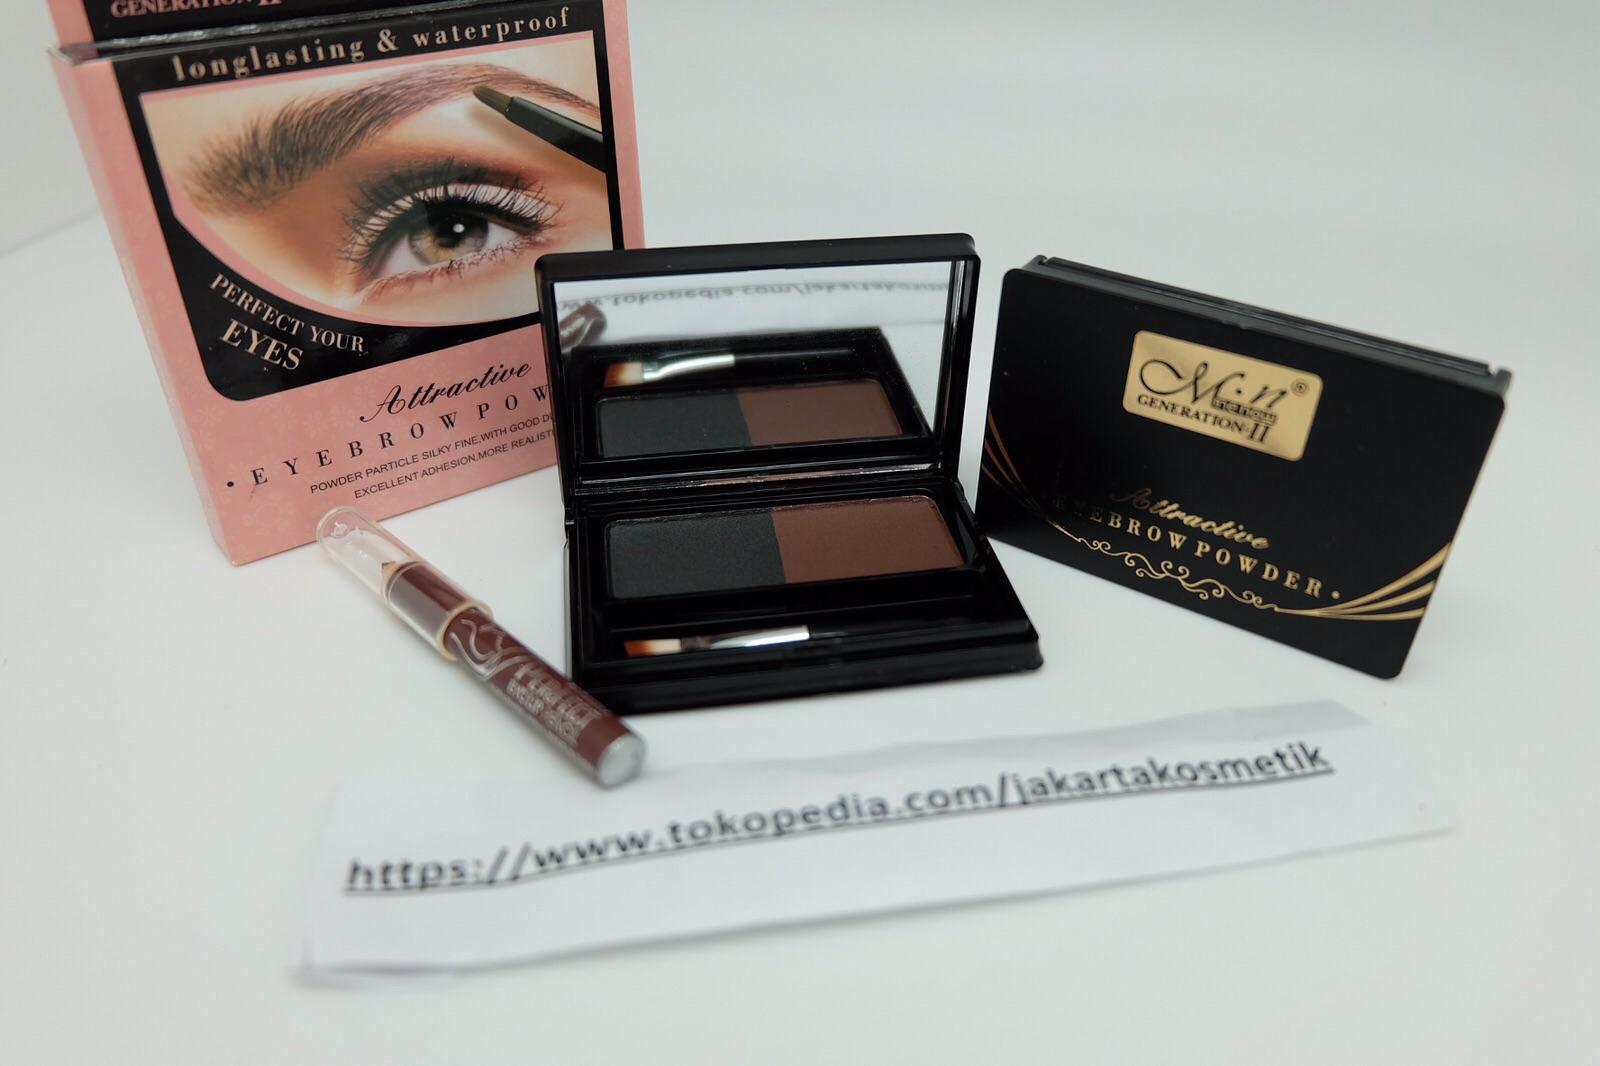 Jual Me Now Eye Brow Powder Pensil Alis Kosmetik Kecantikan Eyebrow Generation Ii Hermes Toserba Tokopedia